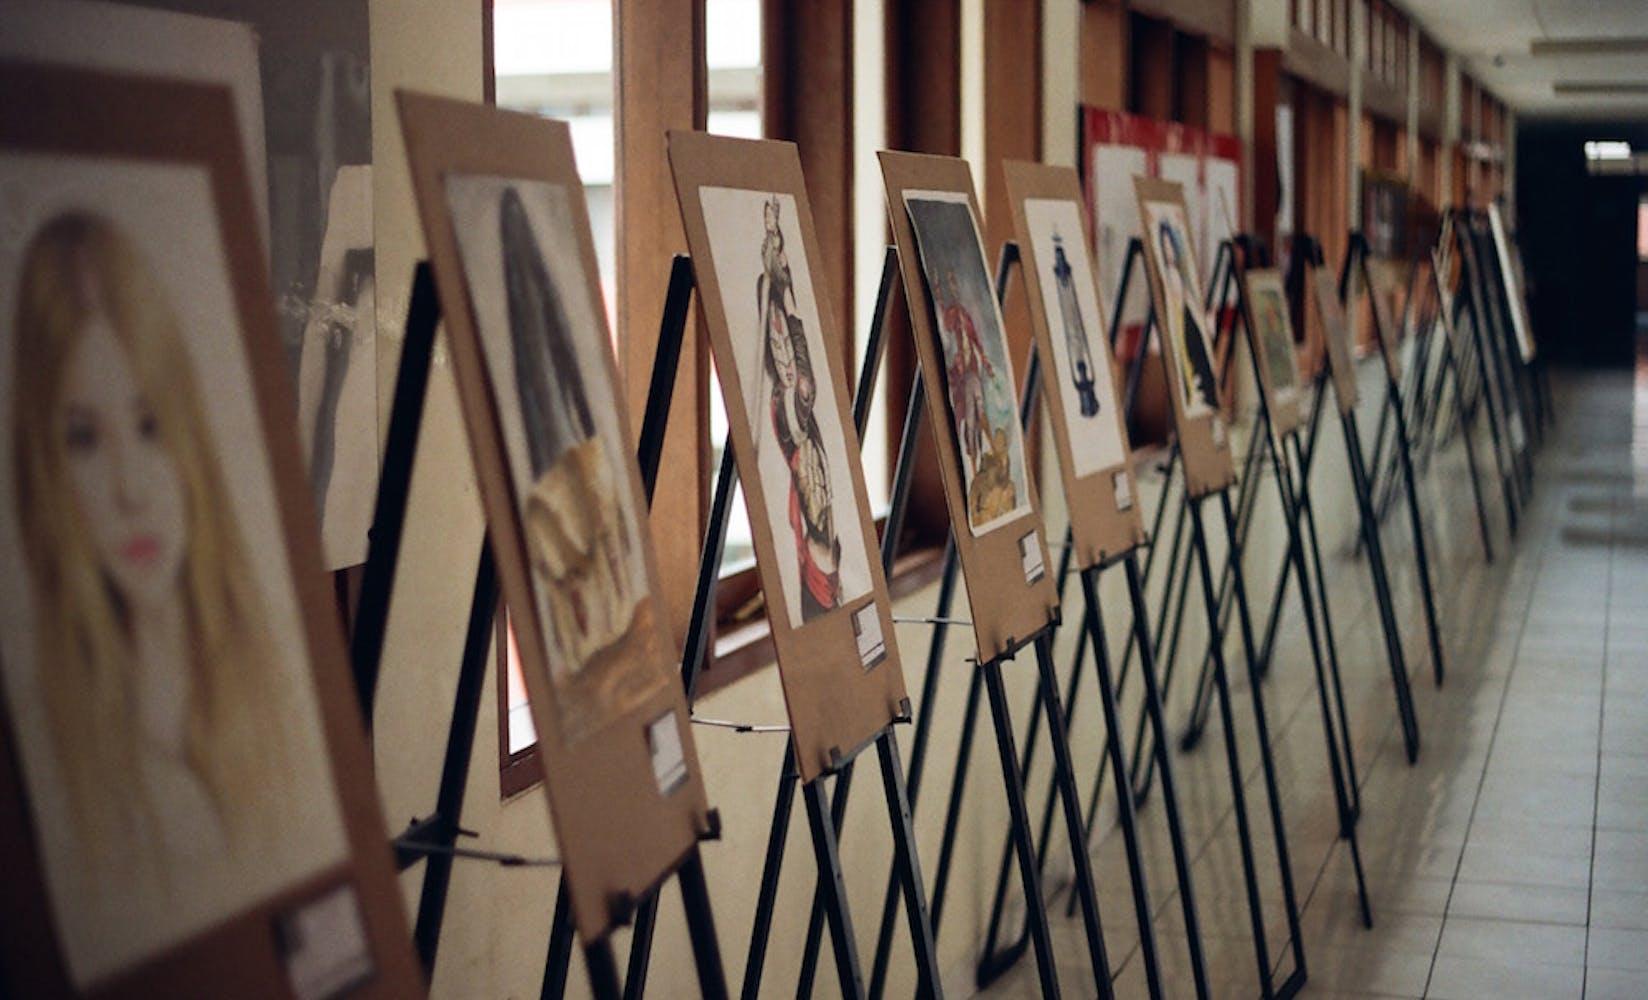 Silent auction fundraiser flipgive